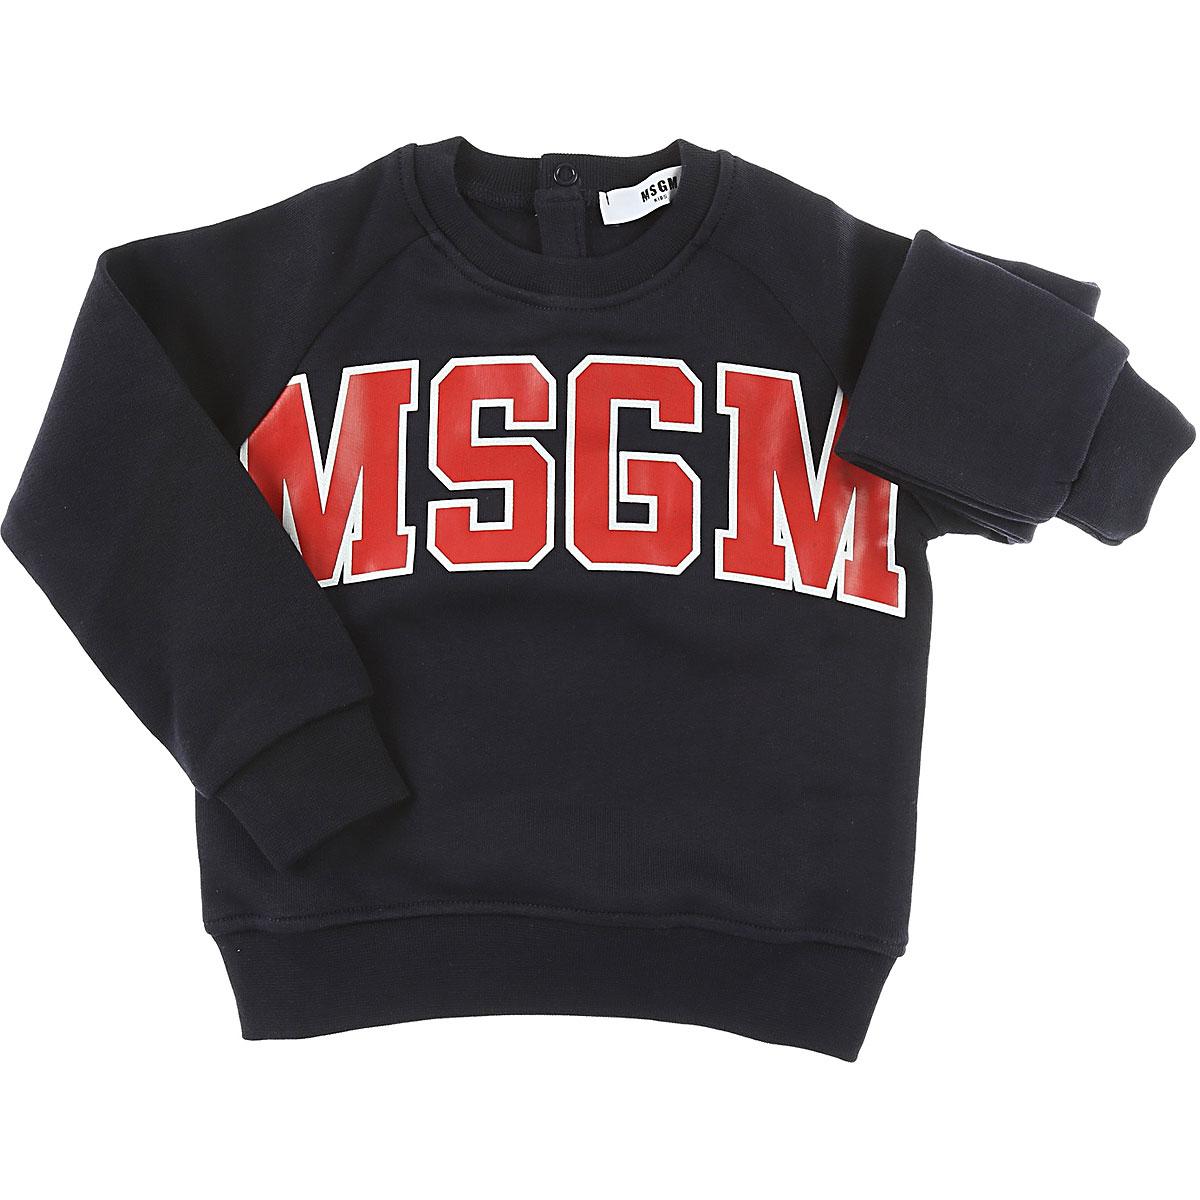 MSGM Baby Sweatshirts & Hoodies for Boys On Sale, Blue, Cotton, 2017, 12M 18M 2Y 9M